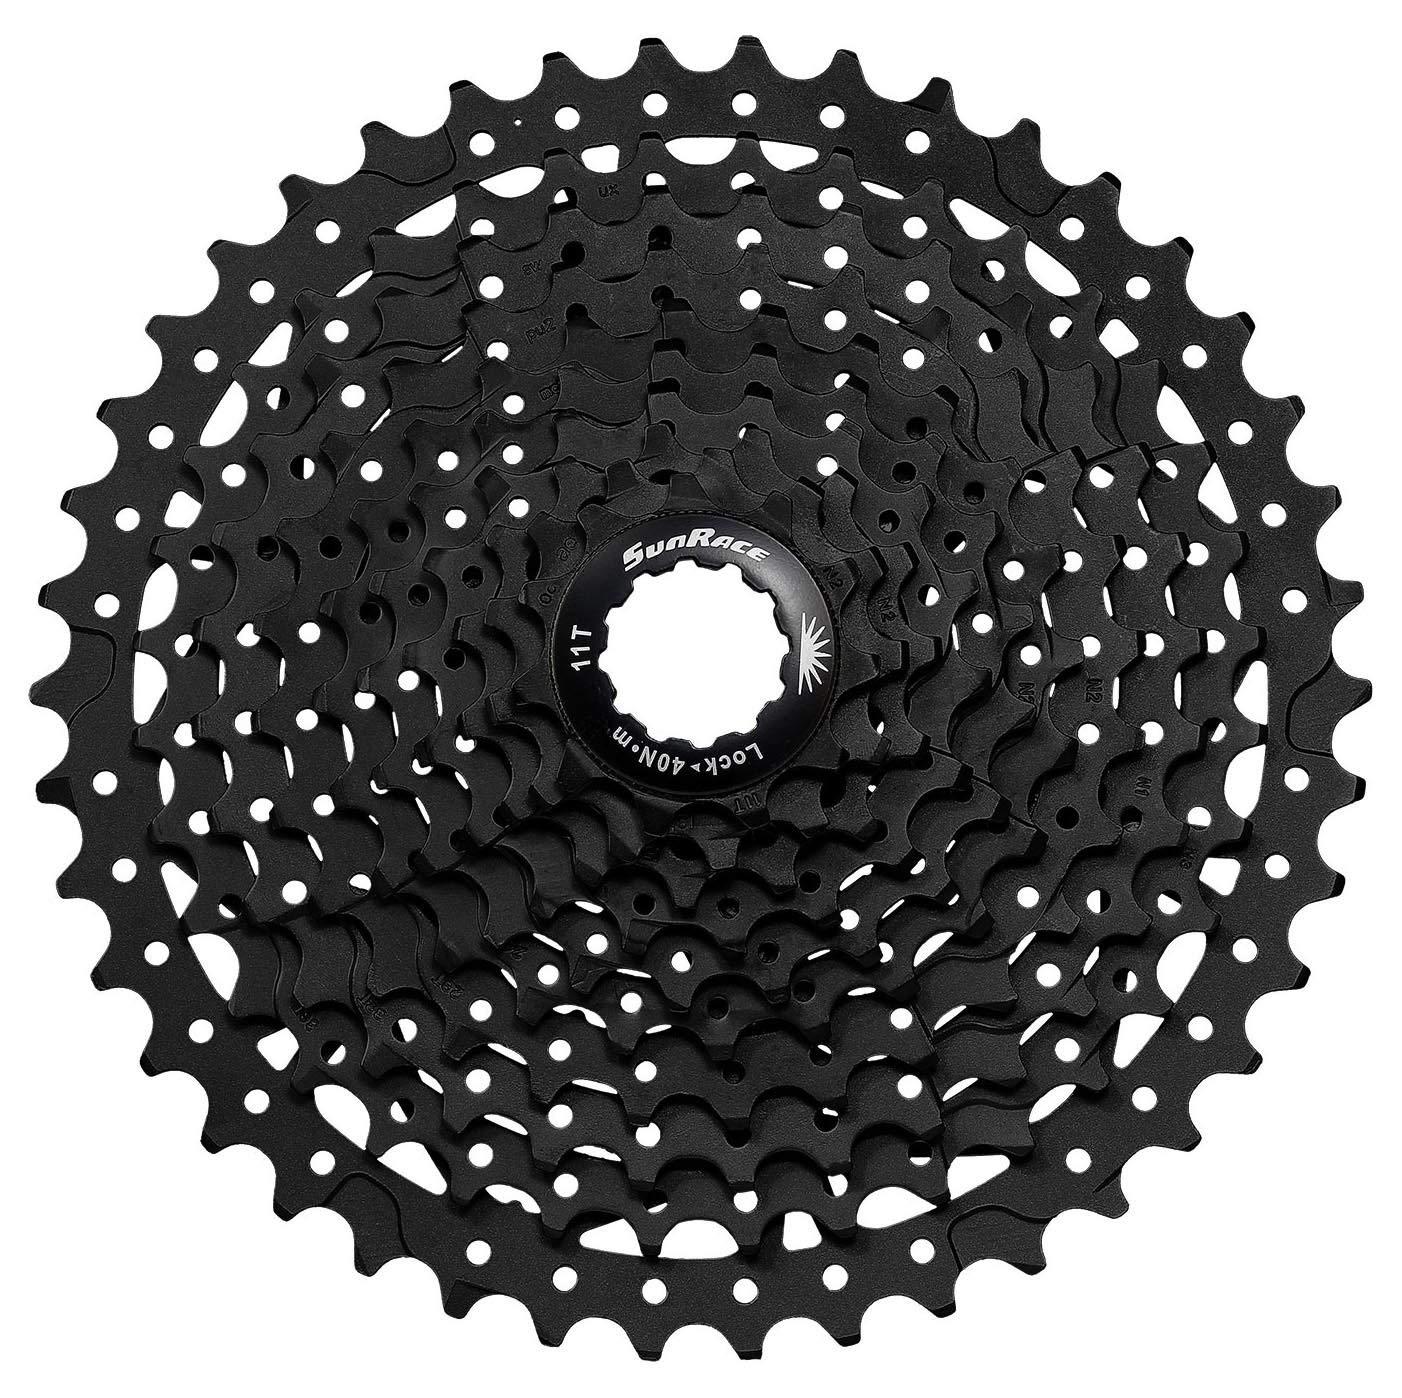 SunRace MS3 10 Speed Mountain Bike Bicycle Cassette Black 11-46T